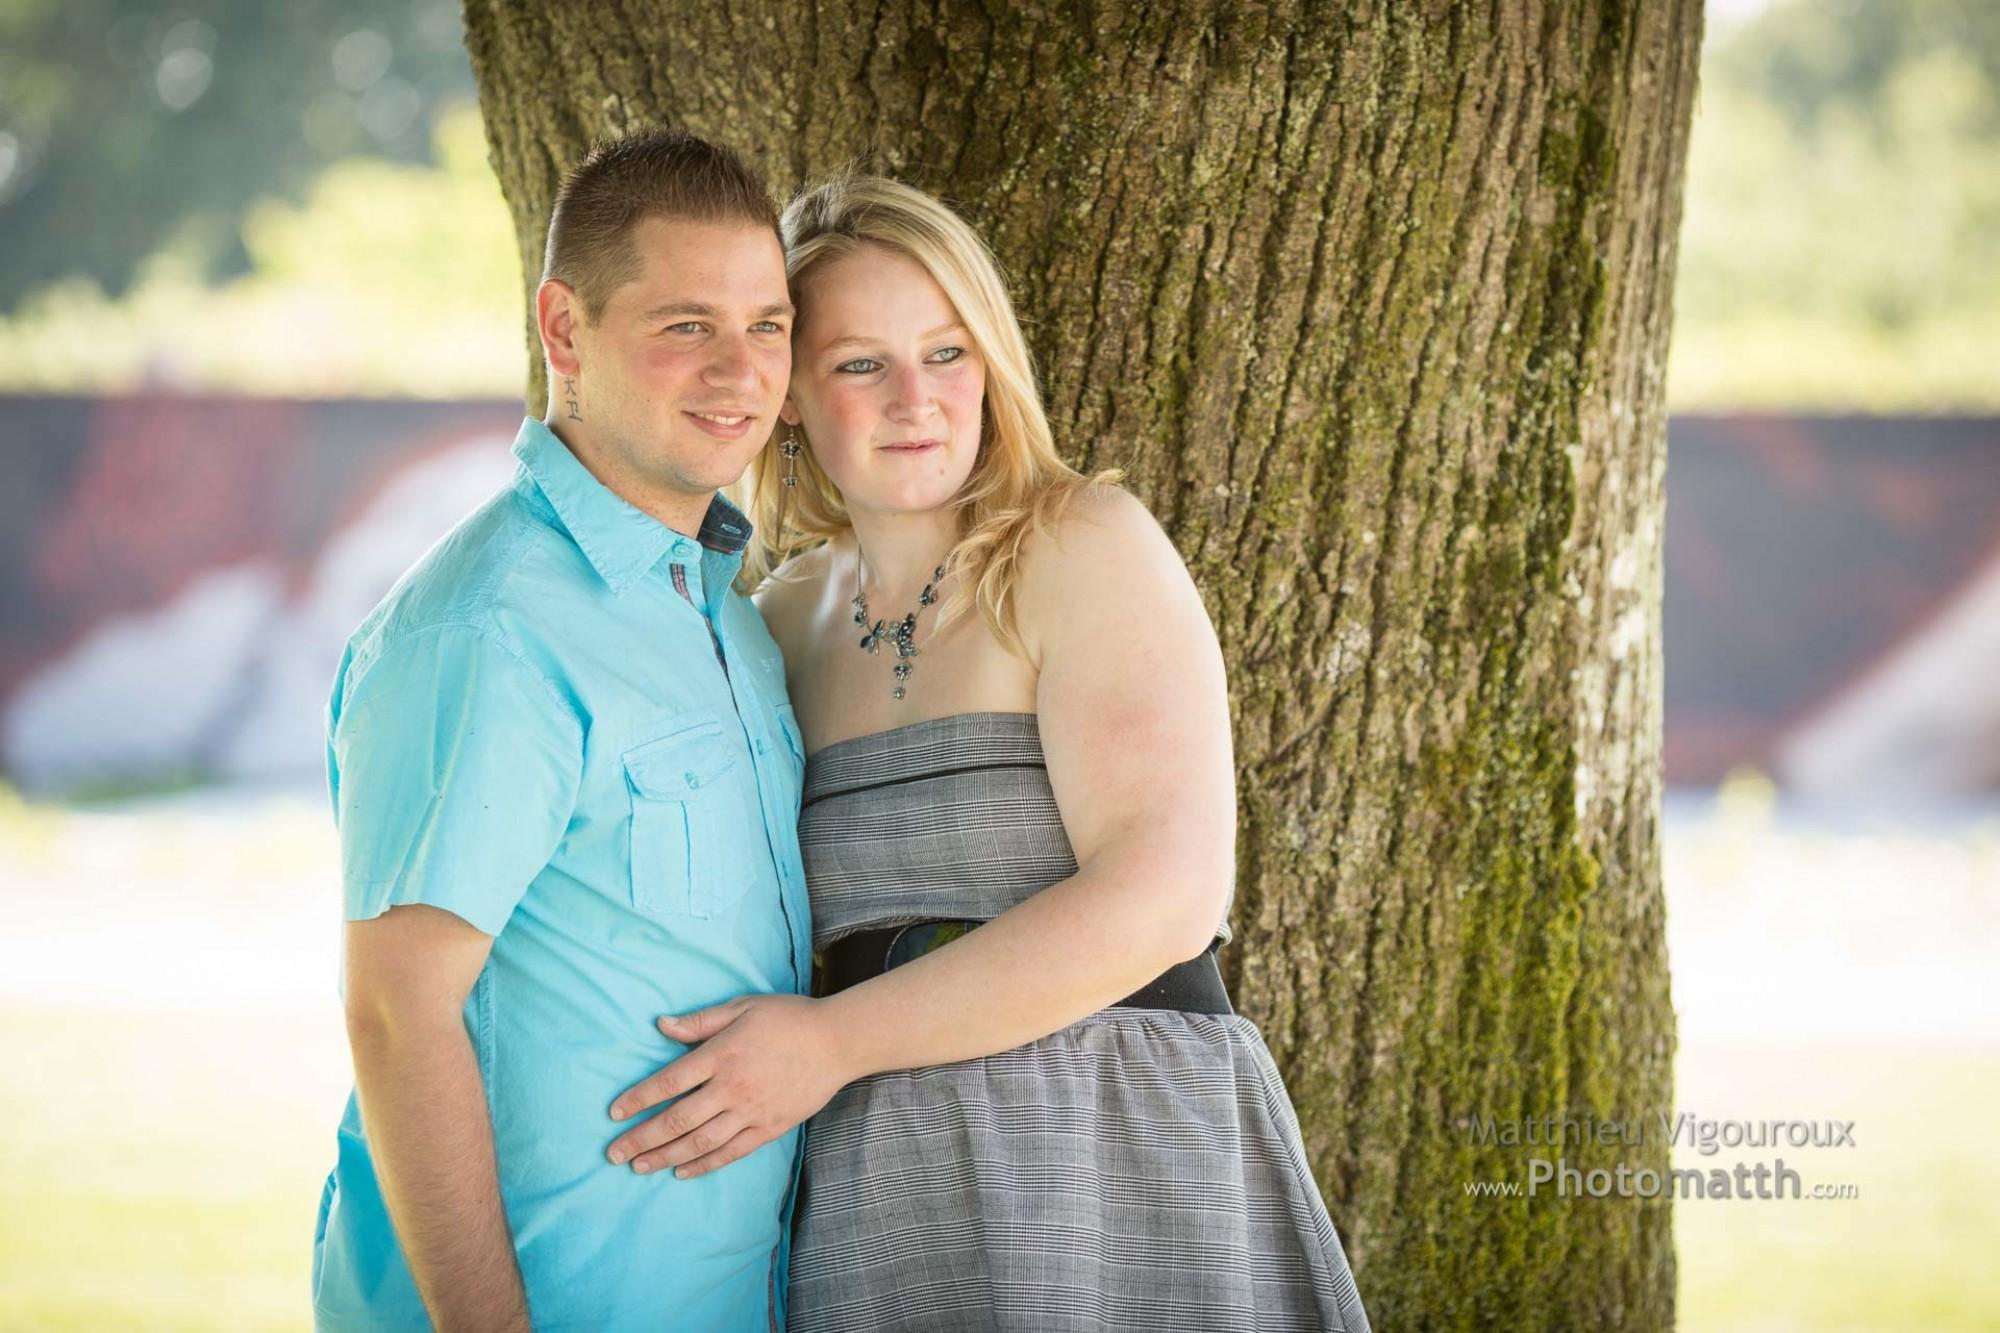 Mariage | Engagement | Christelle + David